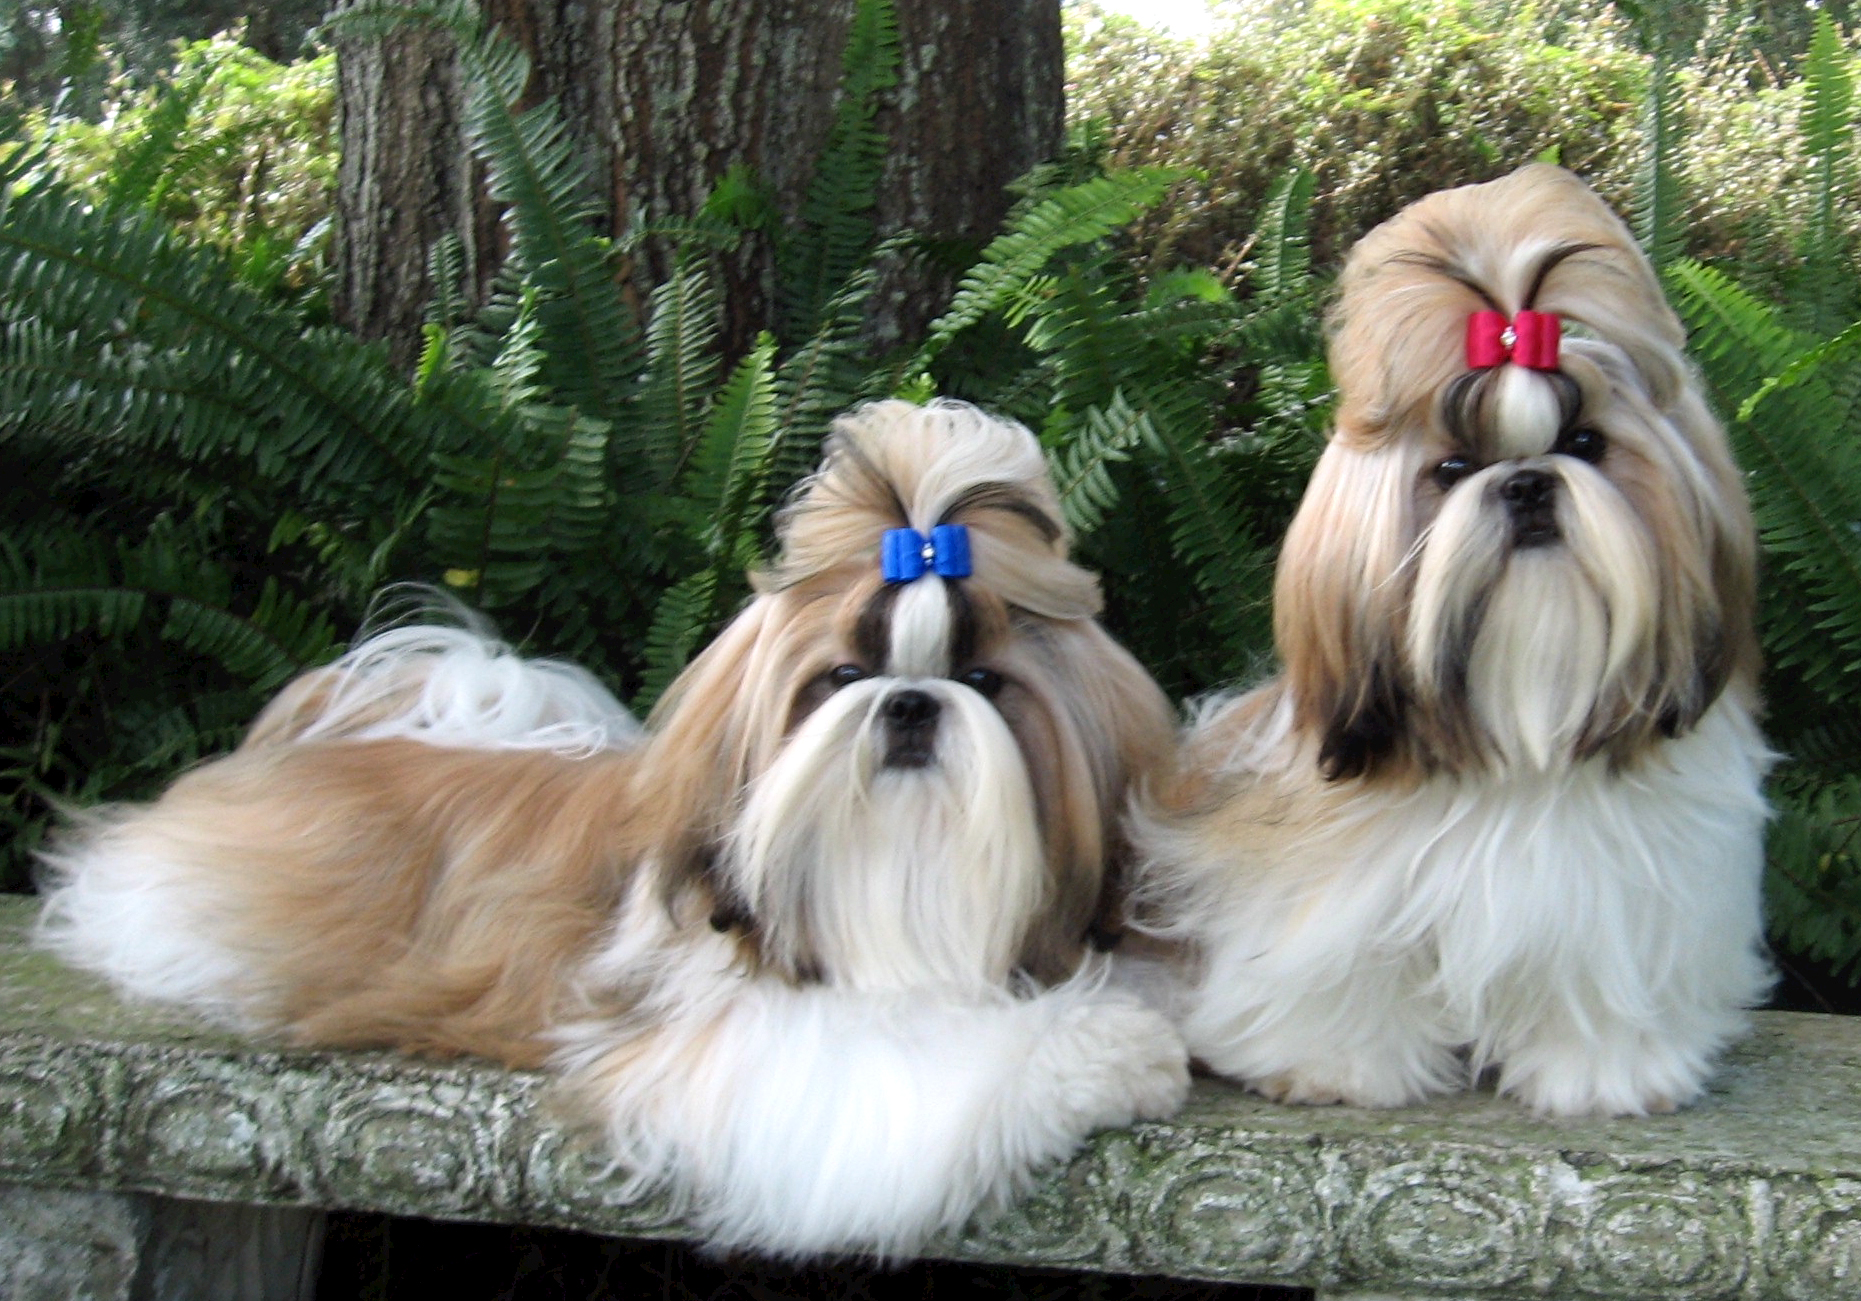 Cute Shih Tzu Dogs Photo And Wallpaper Beautiful Cute Shih Tzu Dogs Pictures